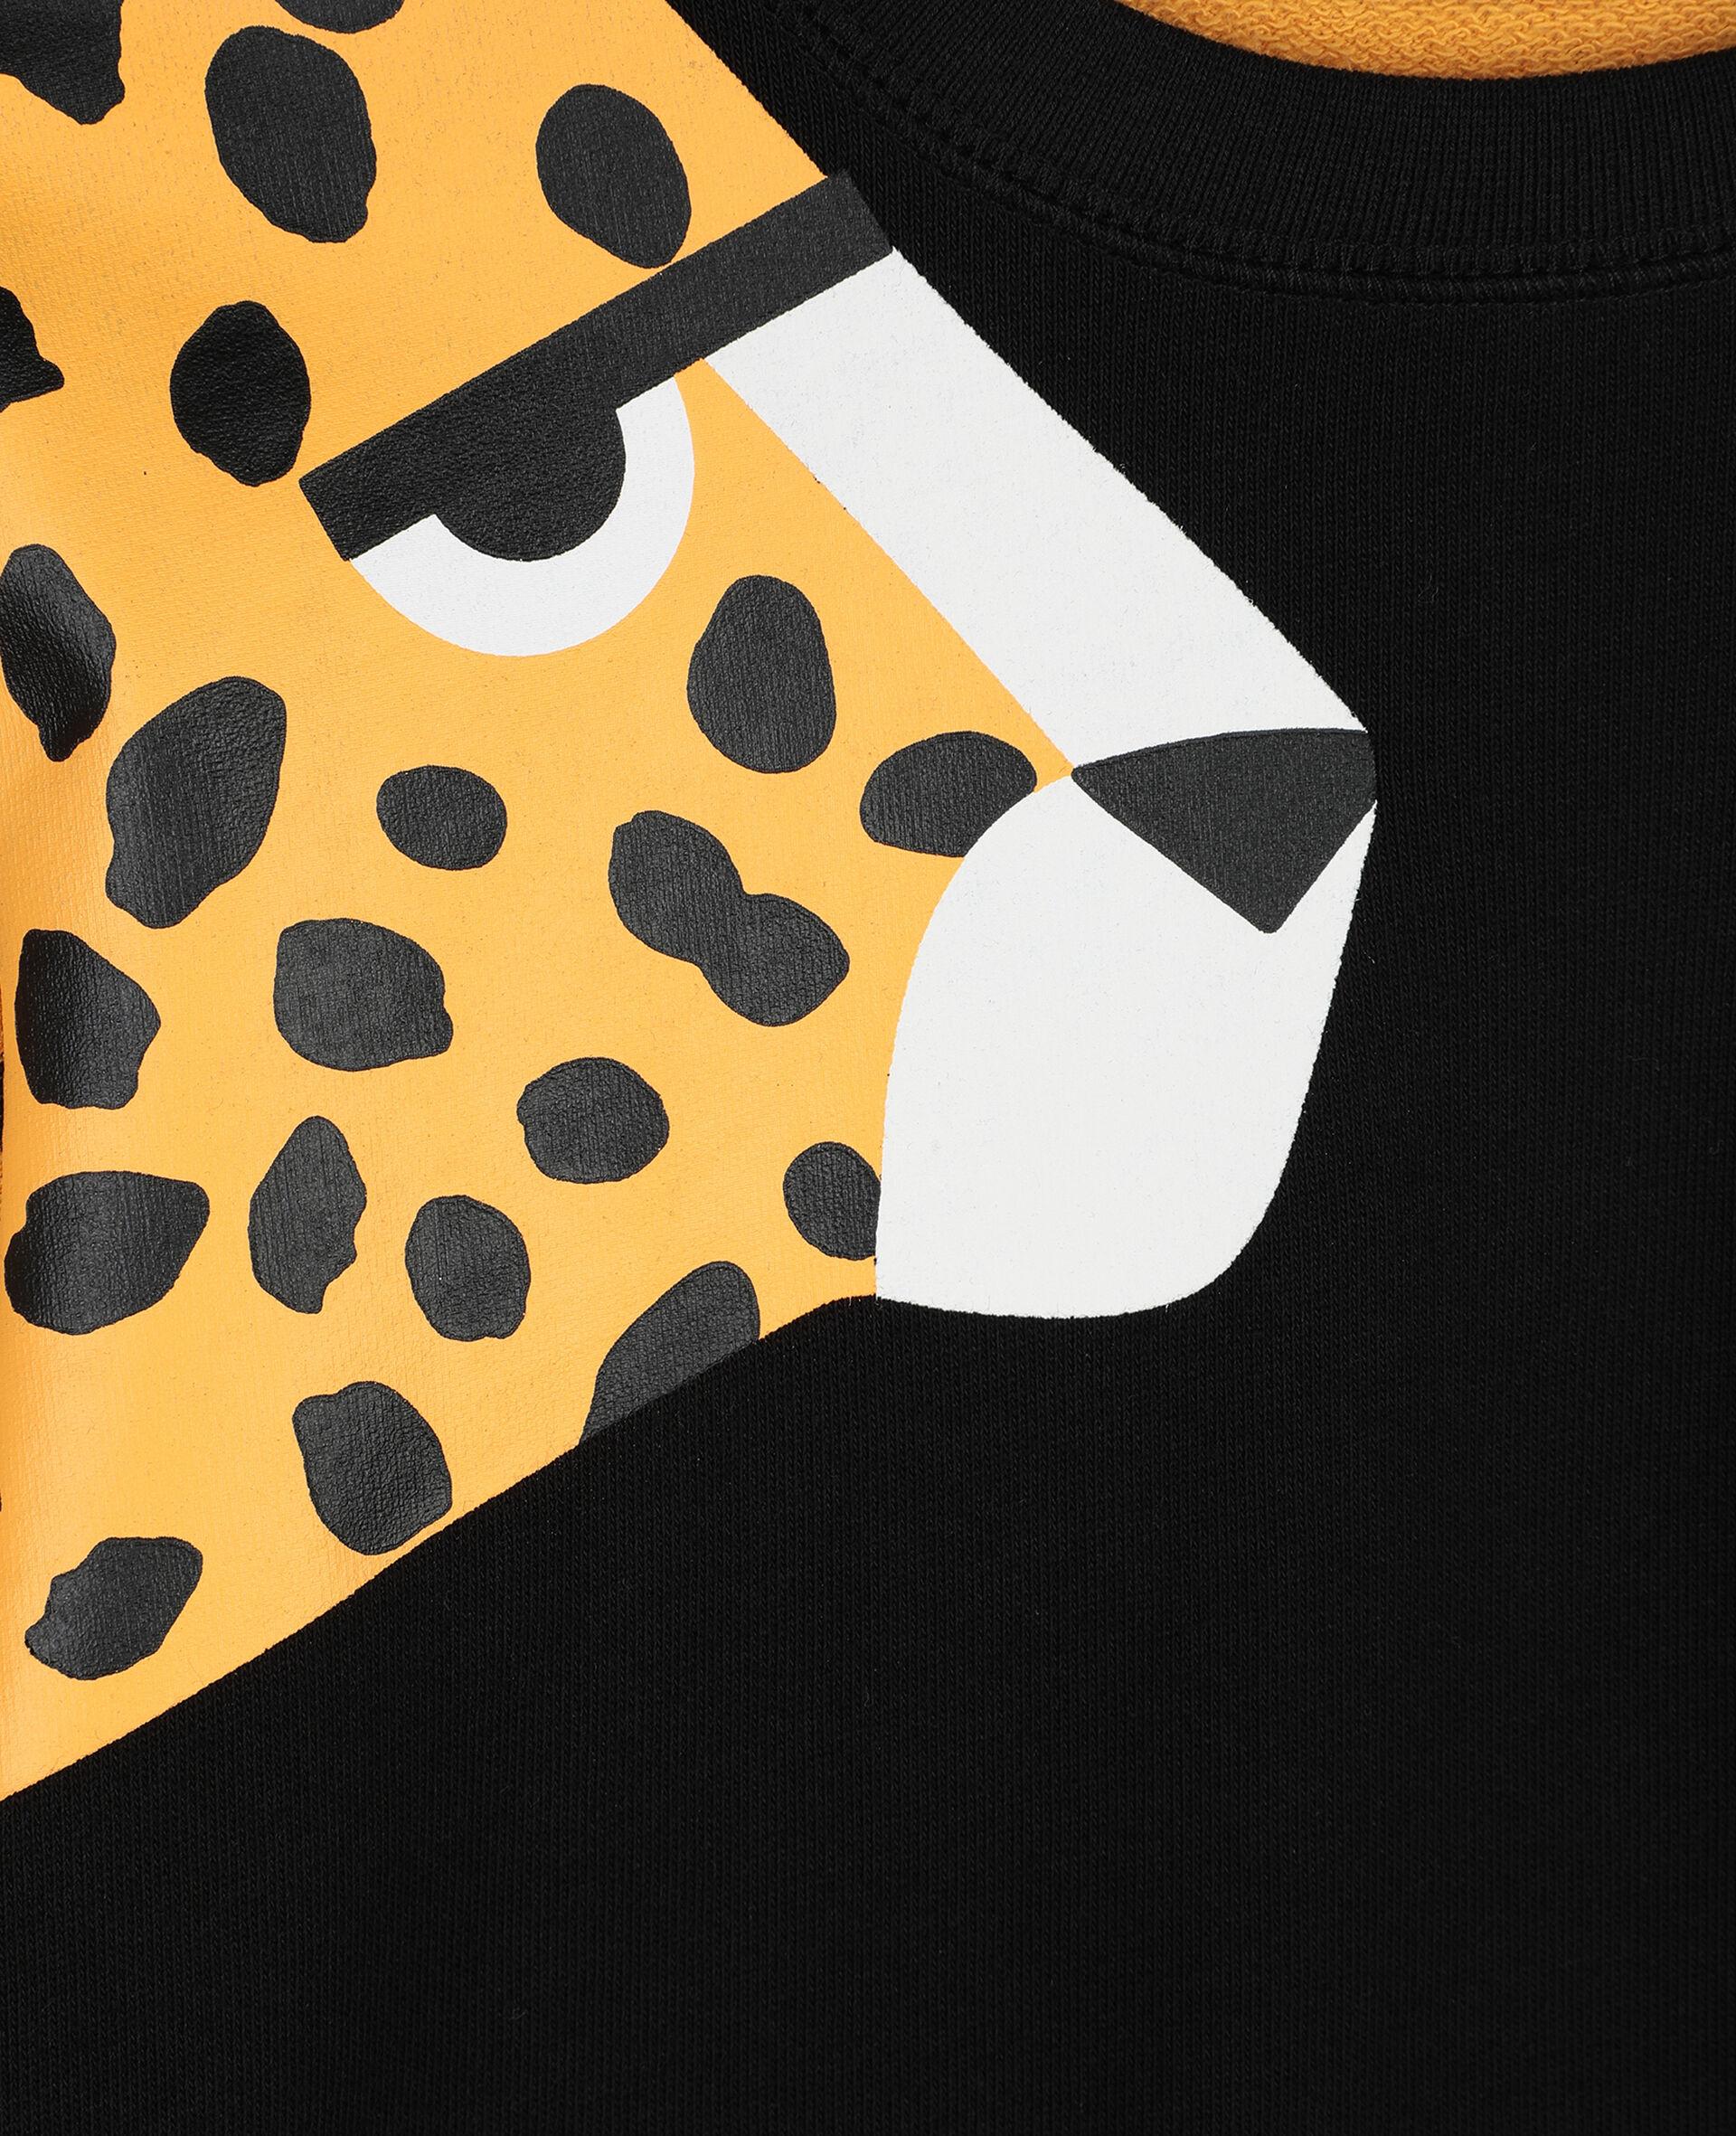 Cheetah Dots棉质抓绒卫衣 -Multicolored-large image number 1